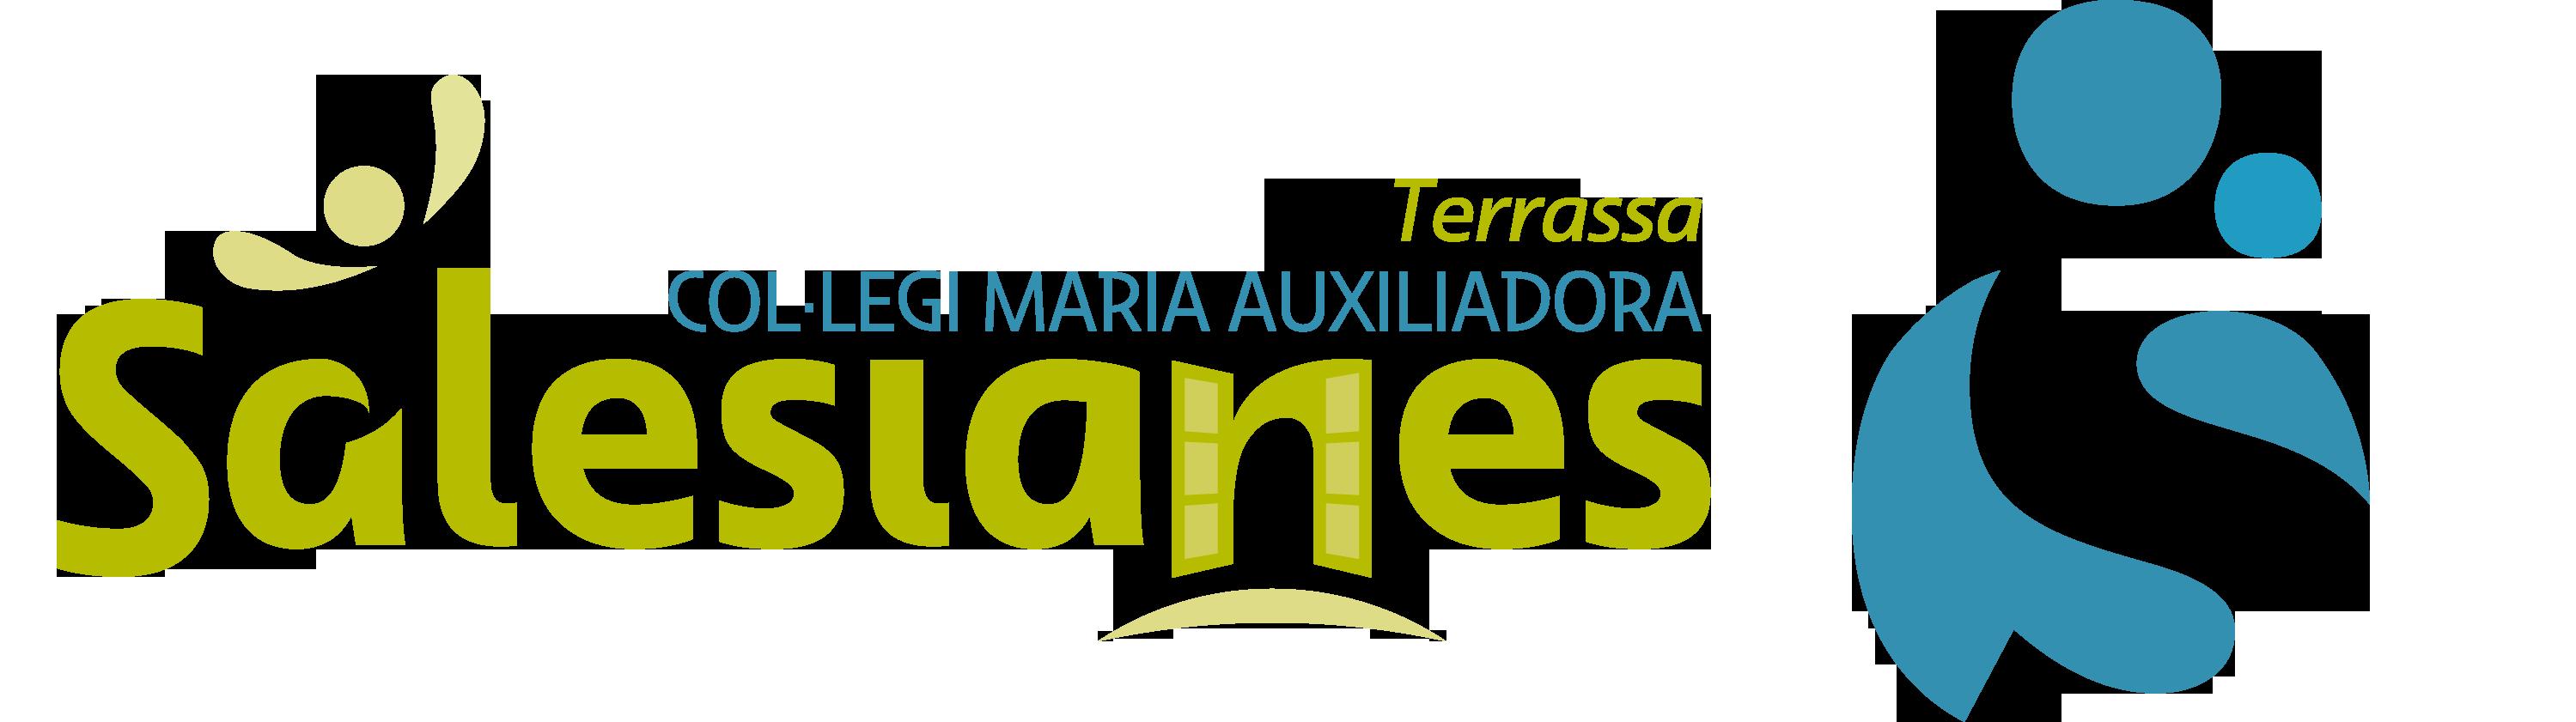 Col·legi Maria Auxiliadora – Terrassa